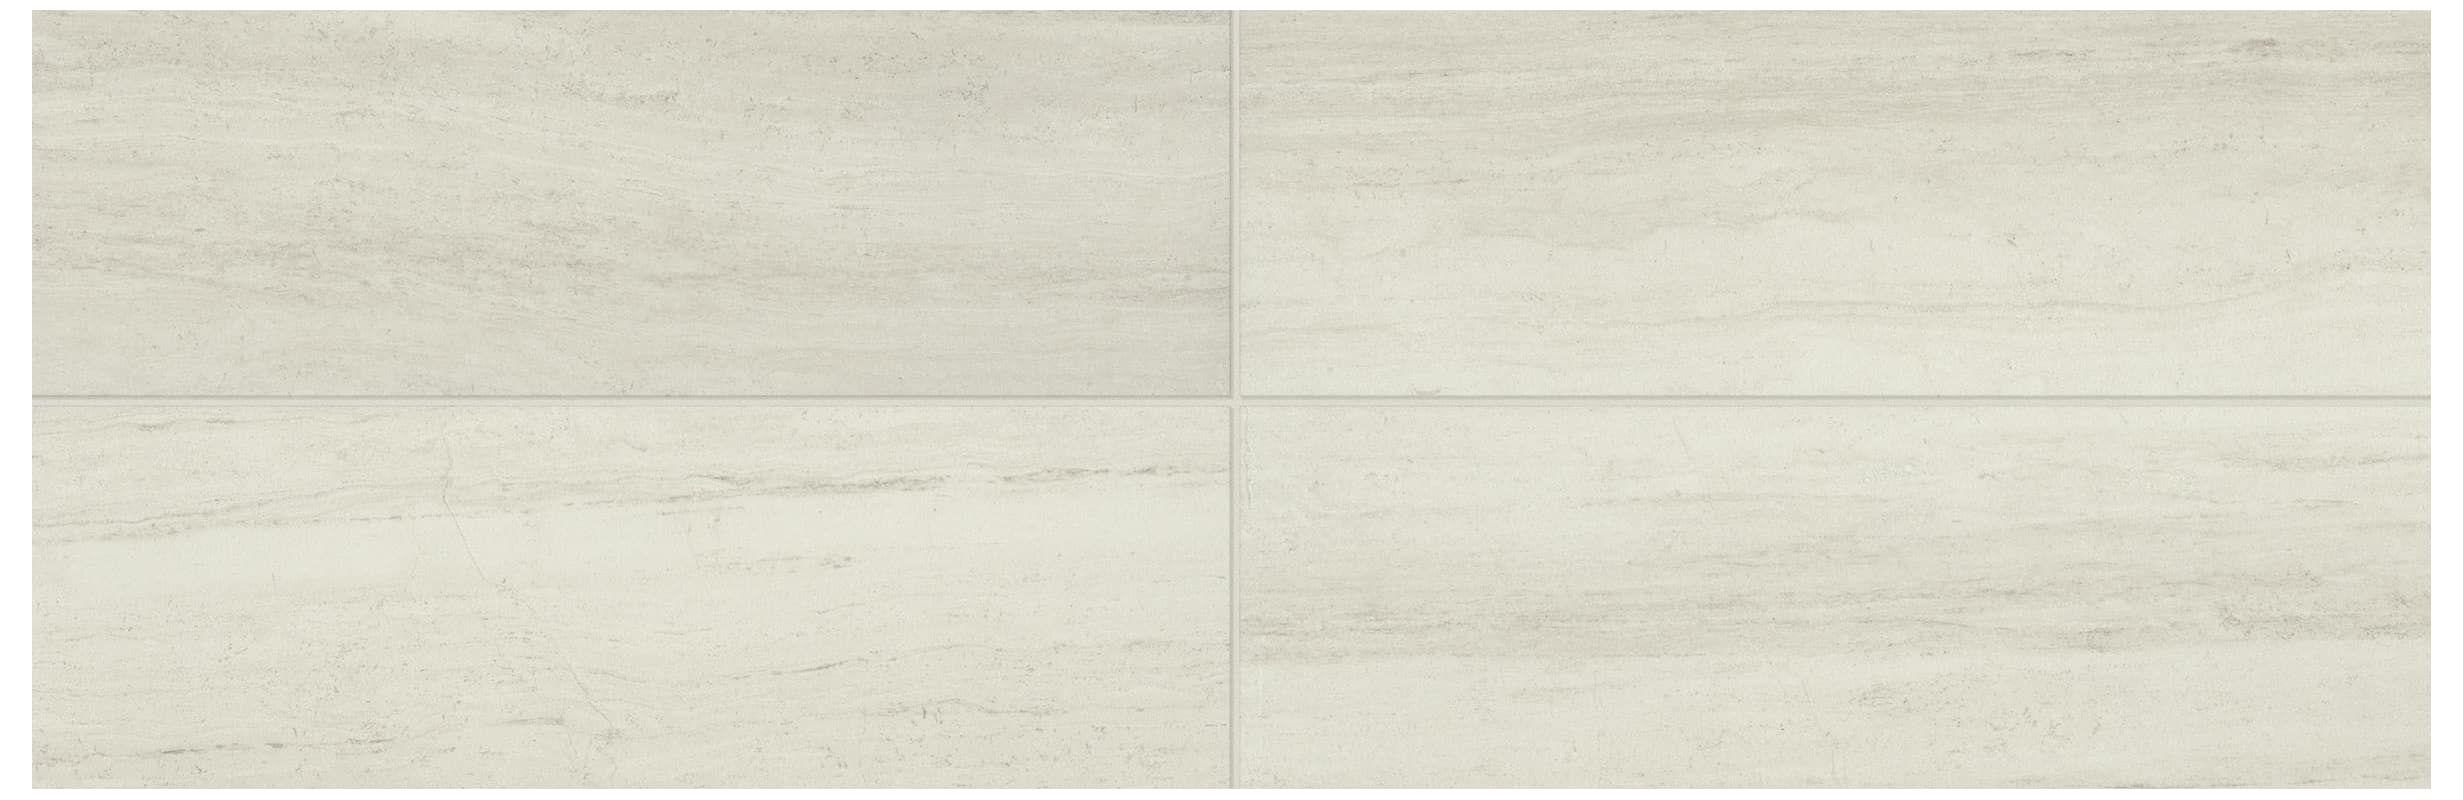 Daltile AR618P Luxury vinyl plank, Tiles, Luxury vinyl